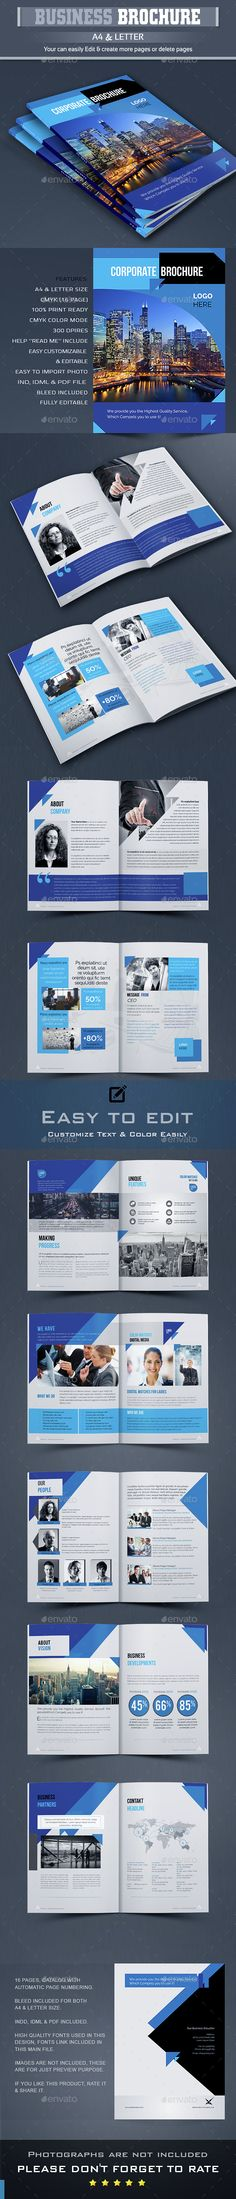 Business Brochure Template InDesign INDD. Download here: http://graphicriver.net/item/business-brochure-/14955826?ref=ksioks